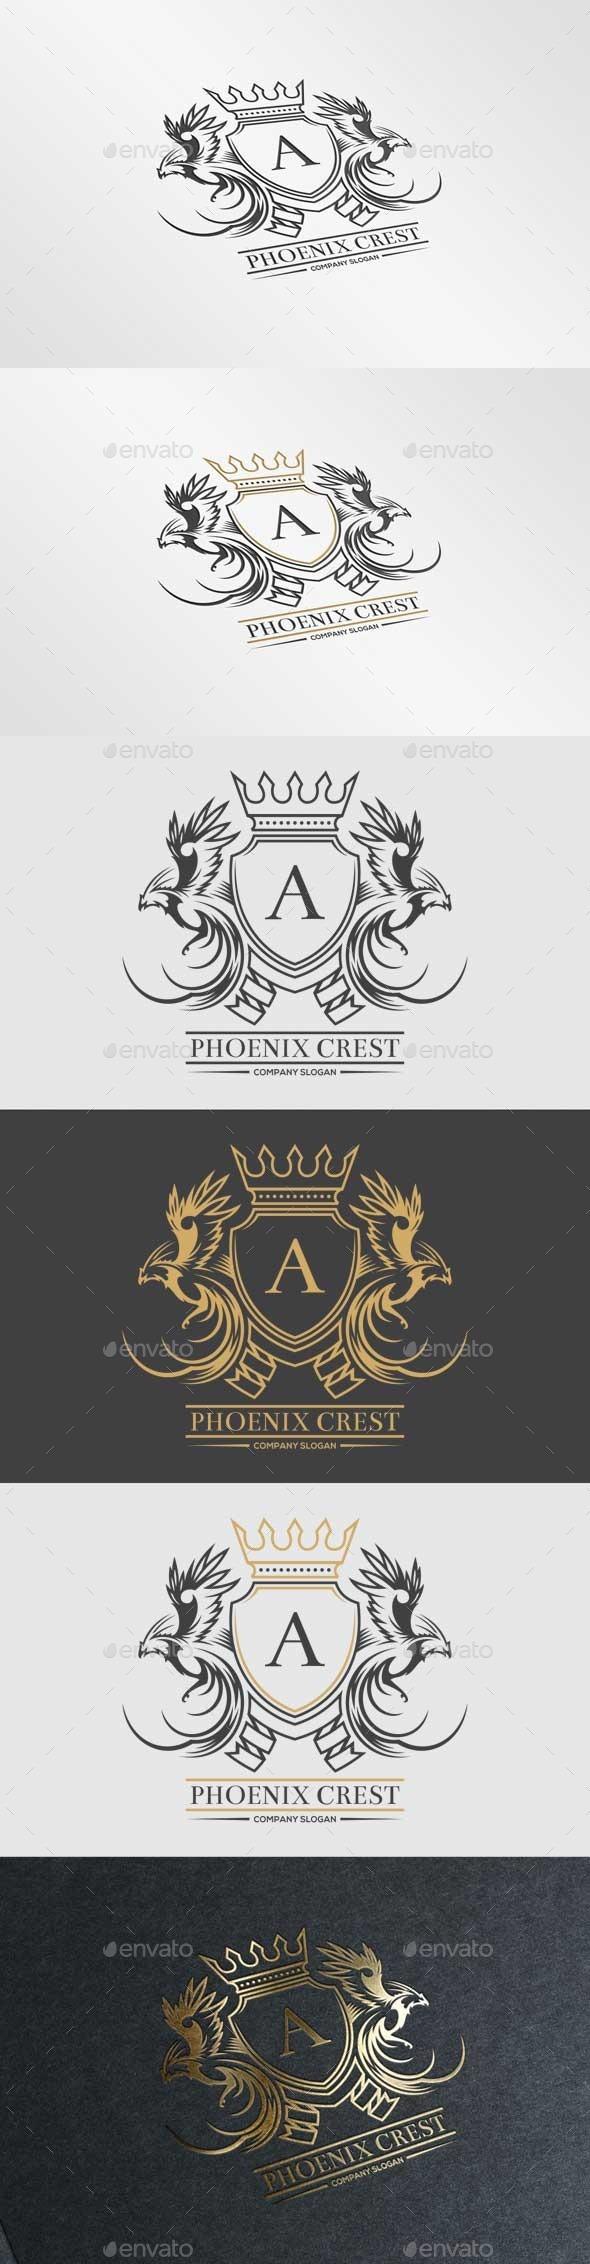 GraphicRiver Phoenix Crest Logo 10718367